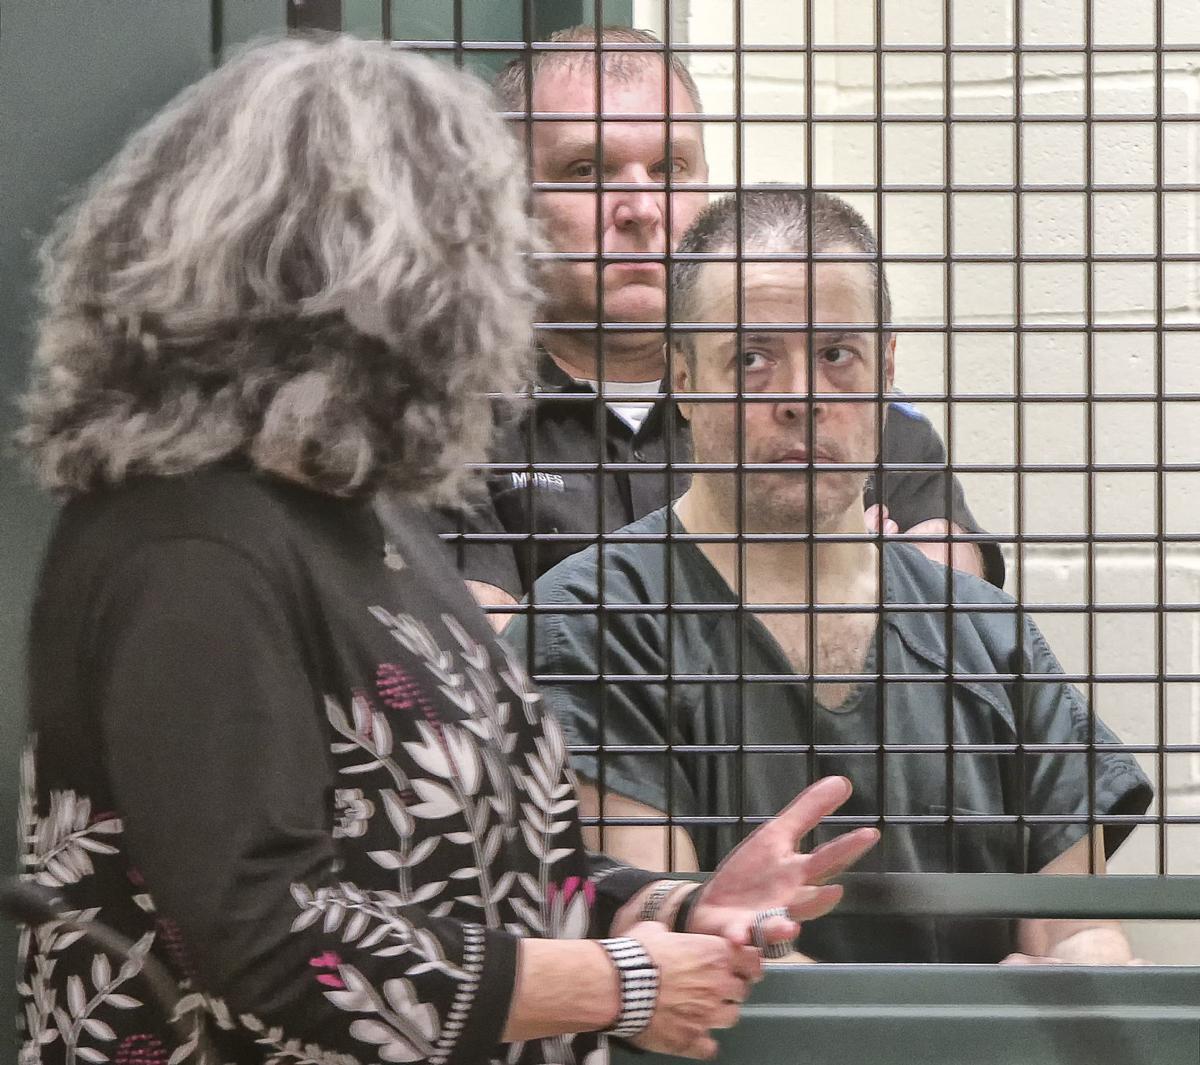 David Altman sentenced